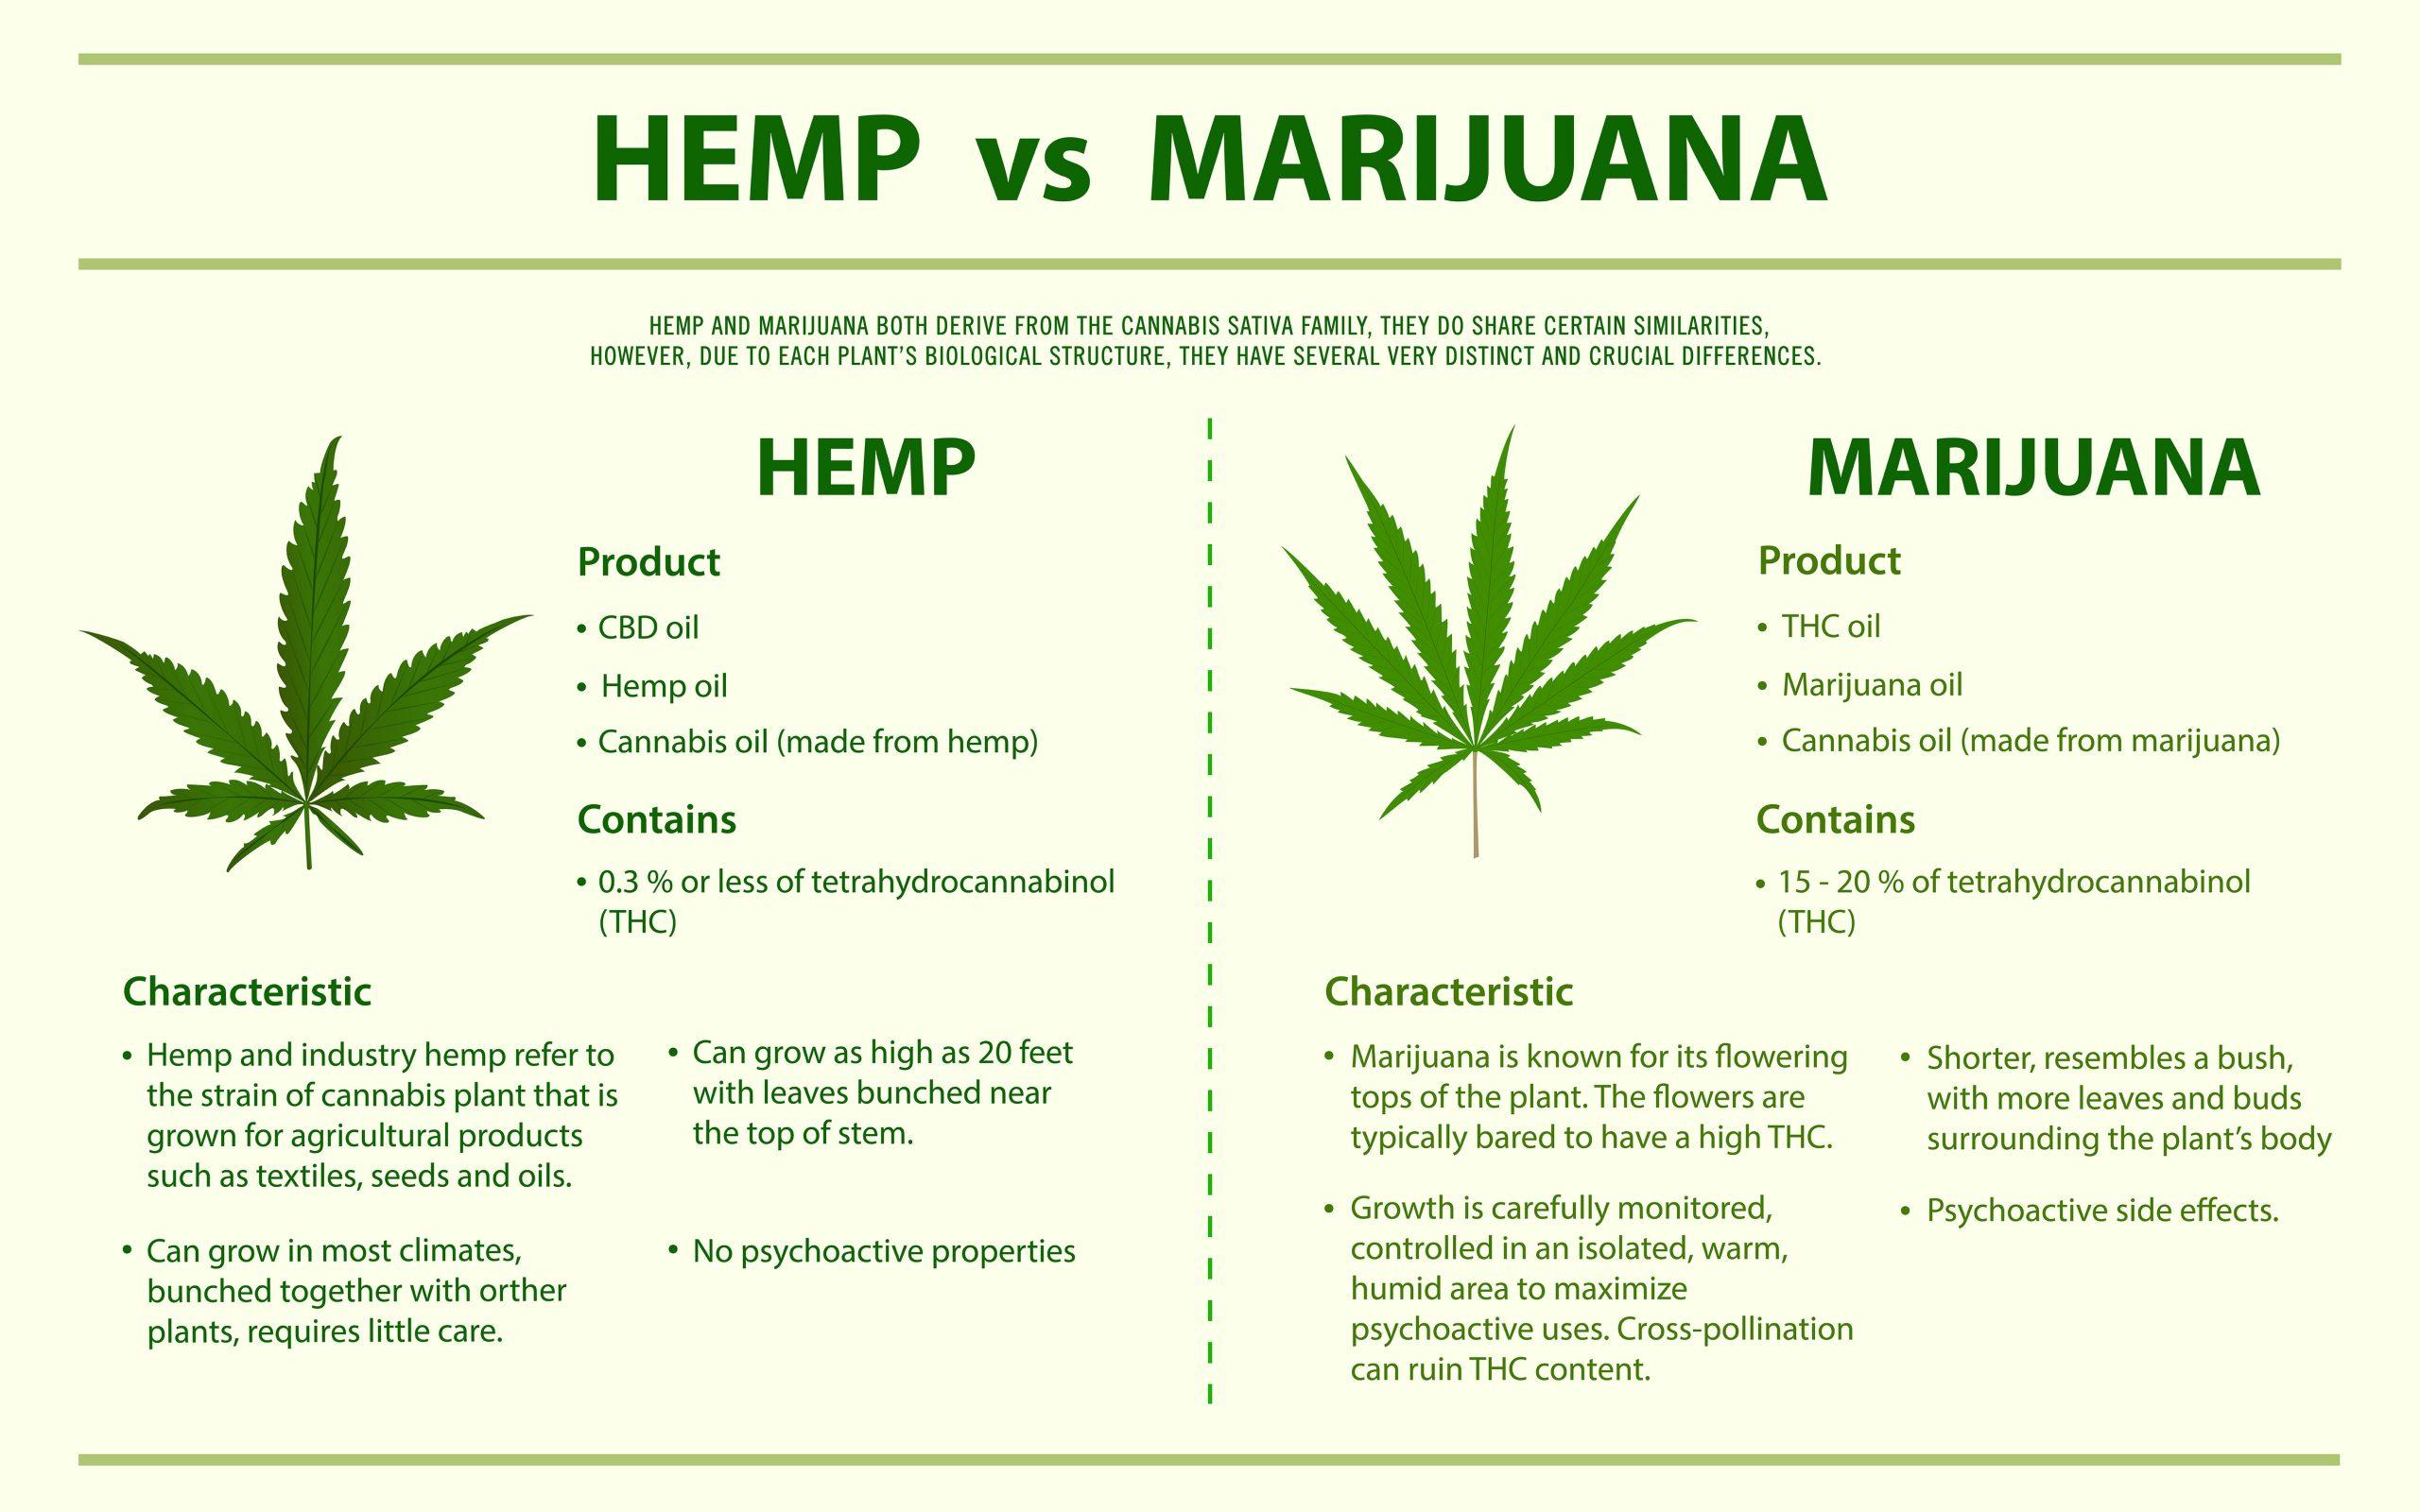 Description of Hemp versus Marijuana